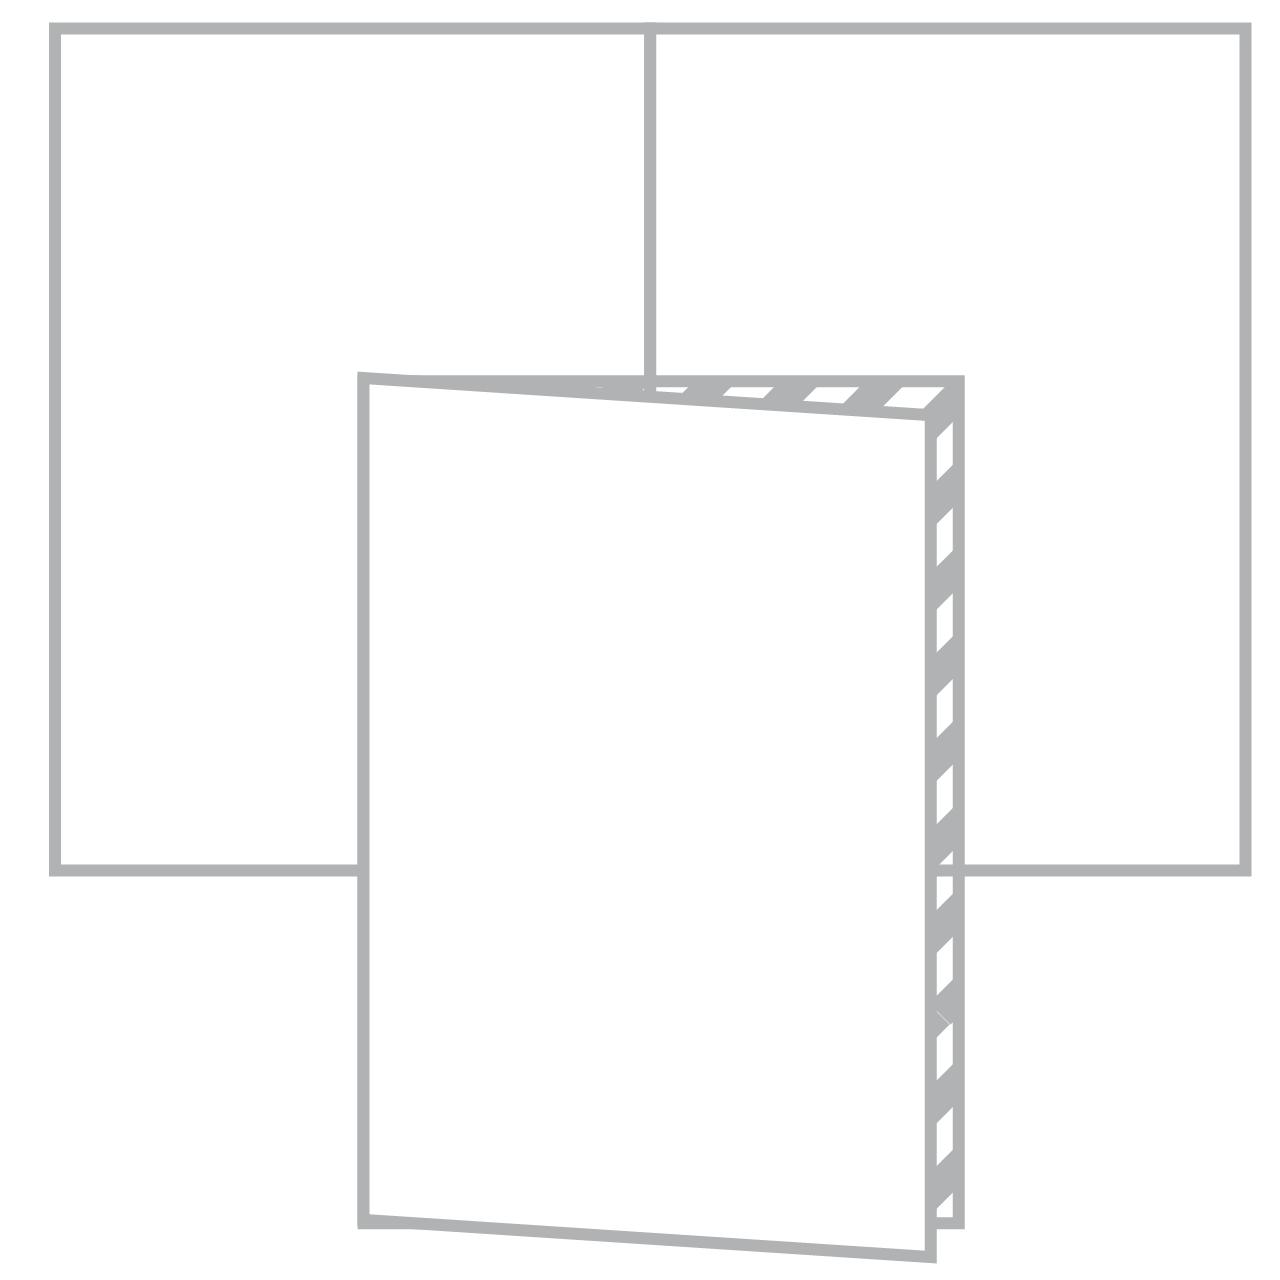 Illustrationen_Karten_DIN_A4_HF_RF589a224dcad4c